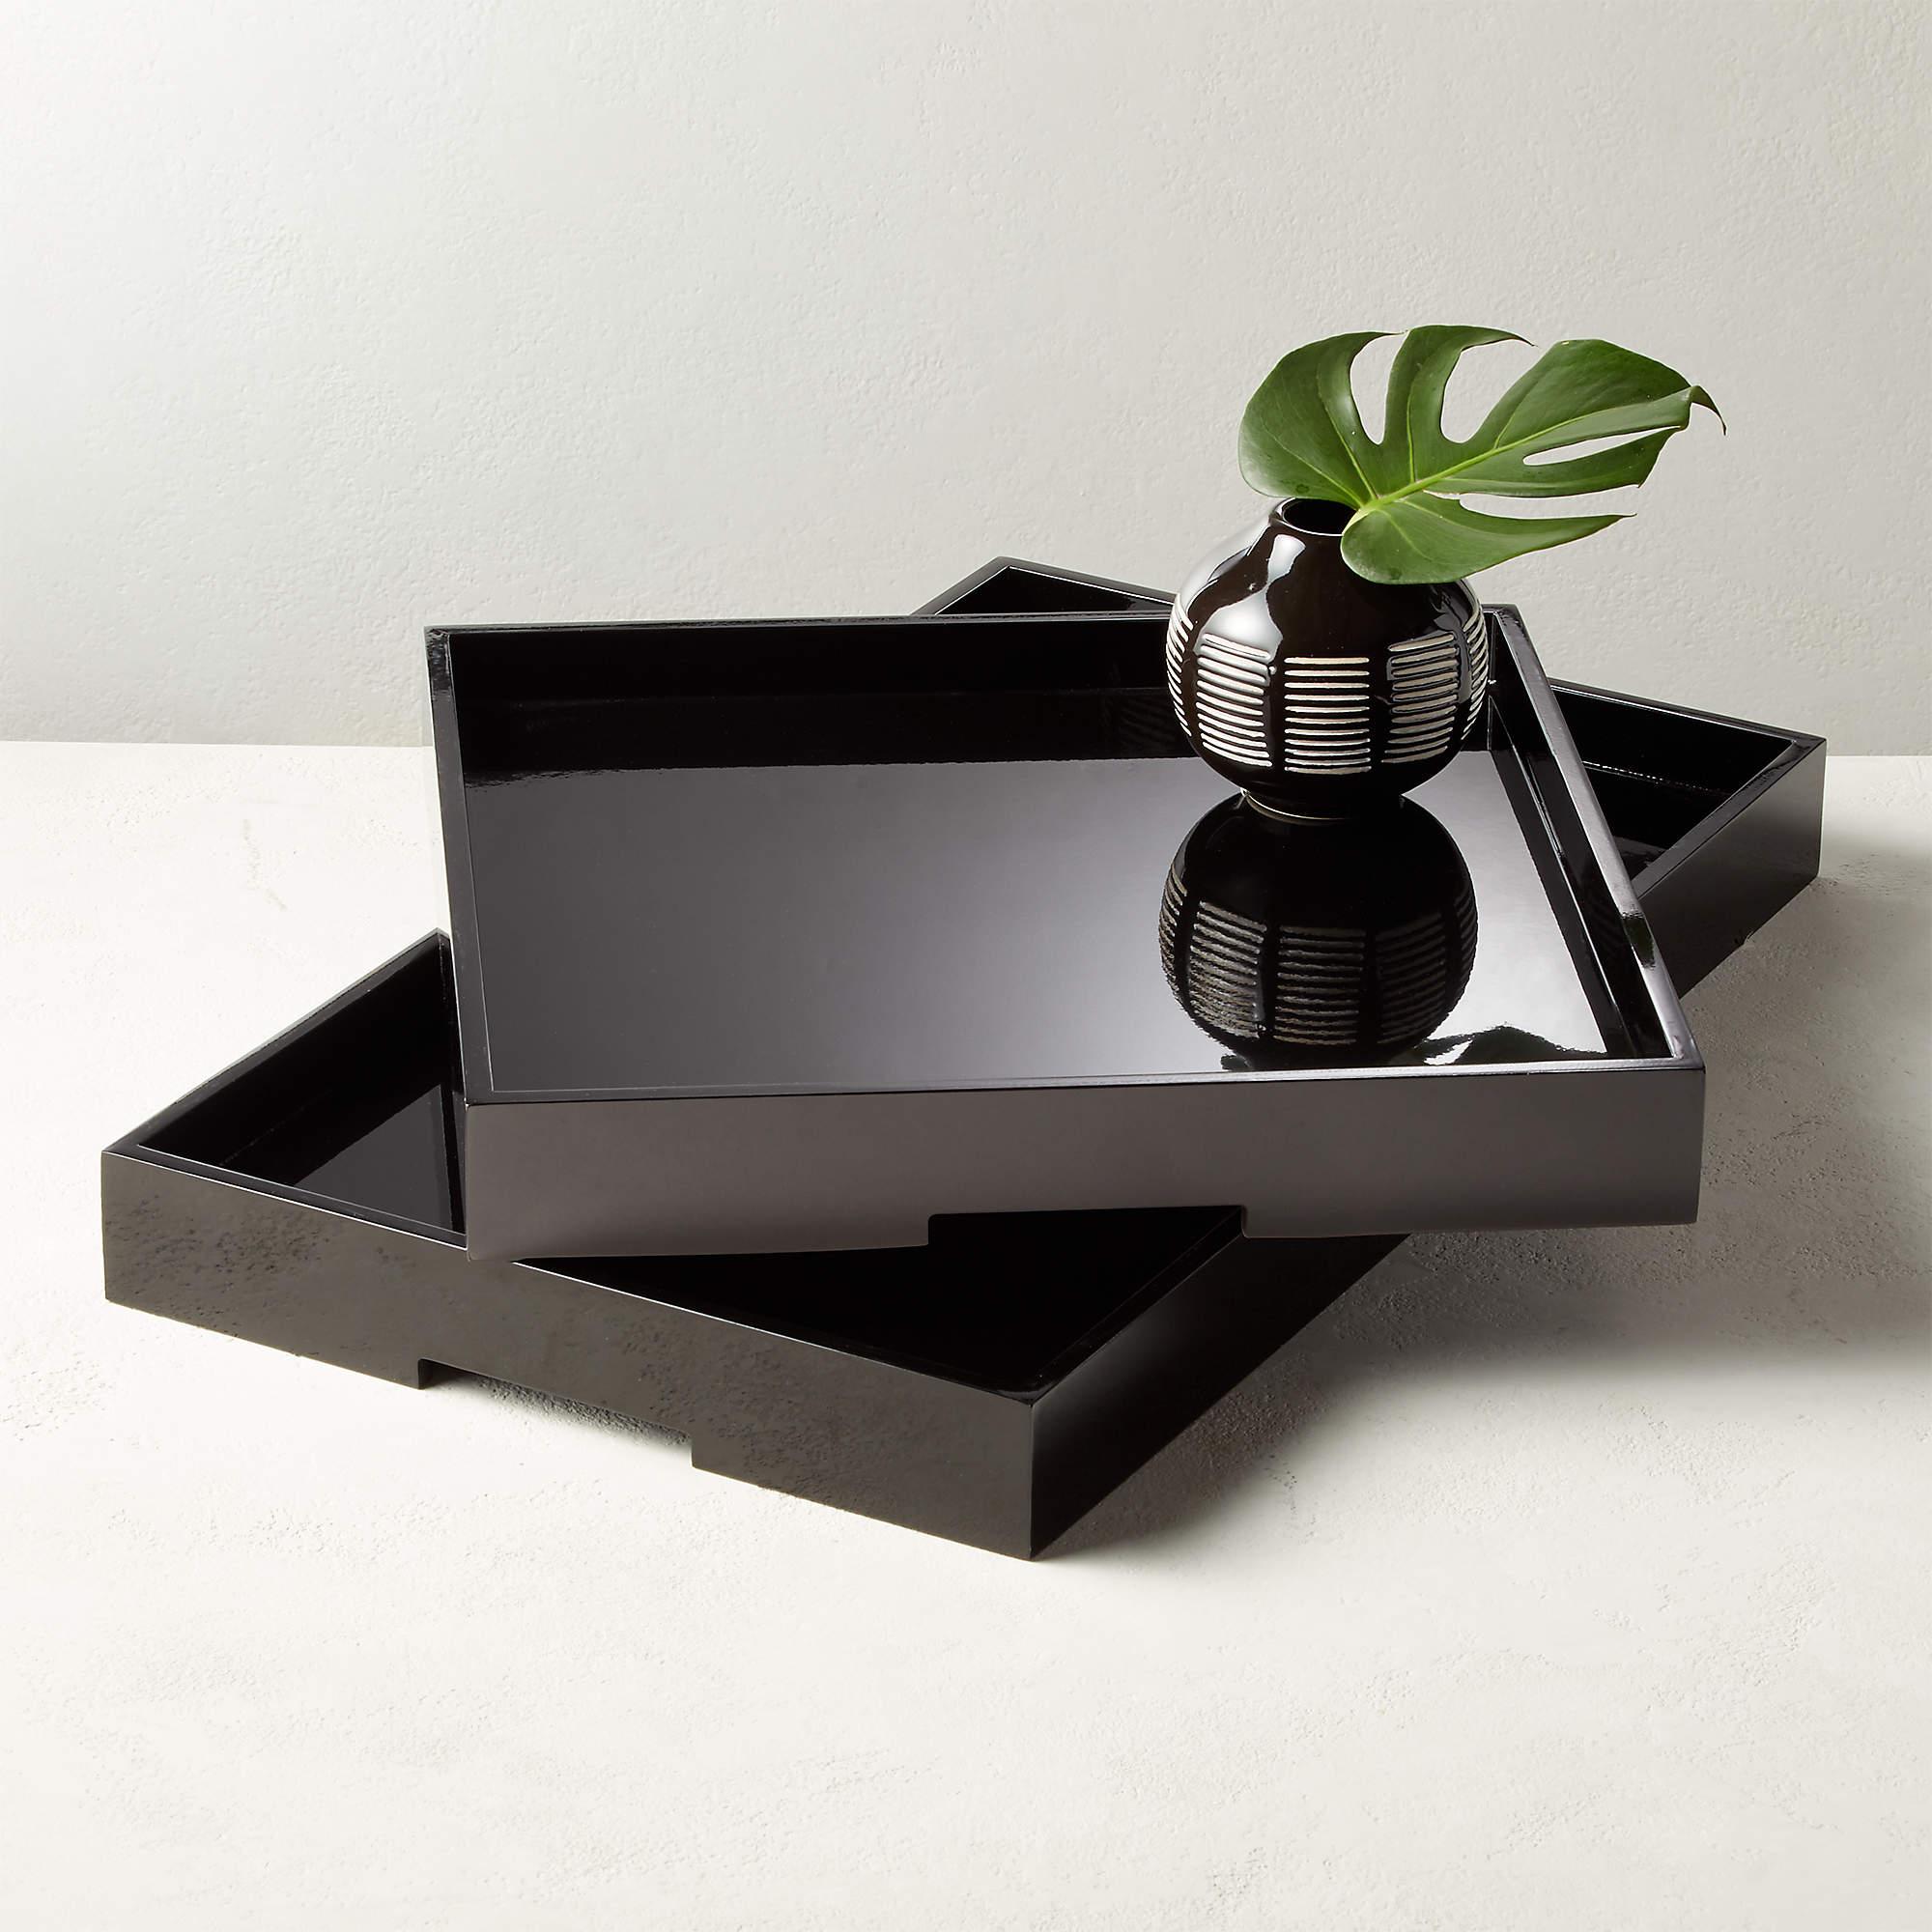 CB2 High Gloss Black Rectangle Tray